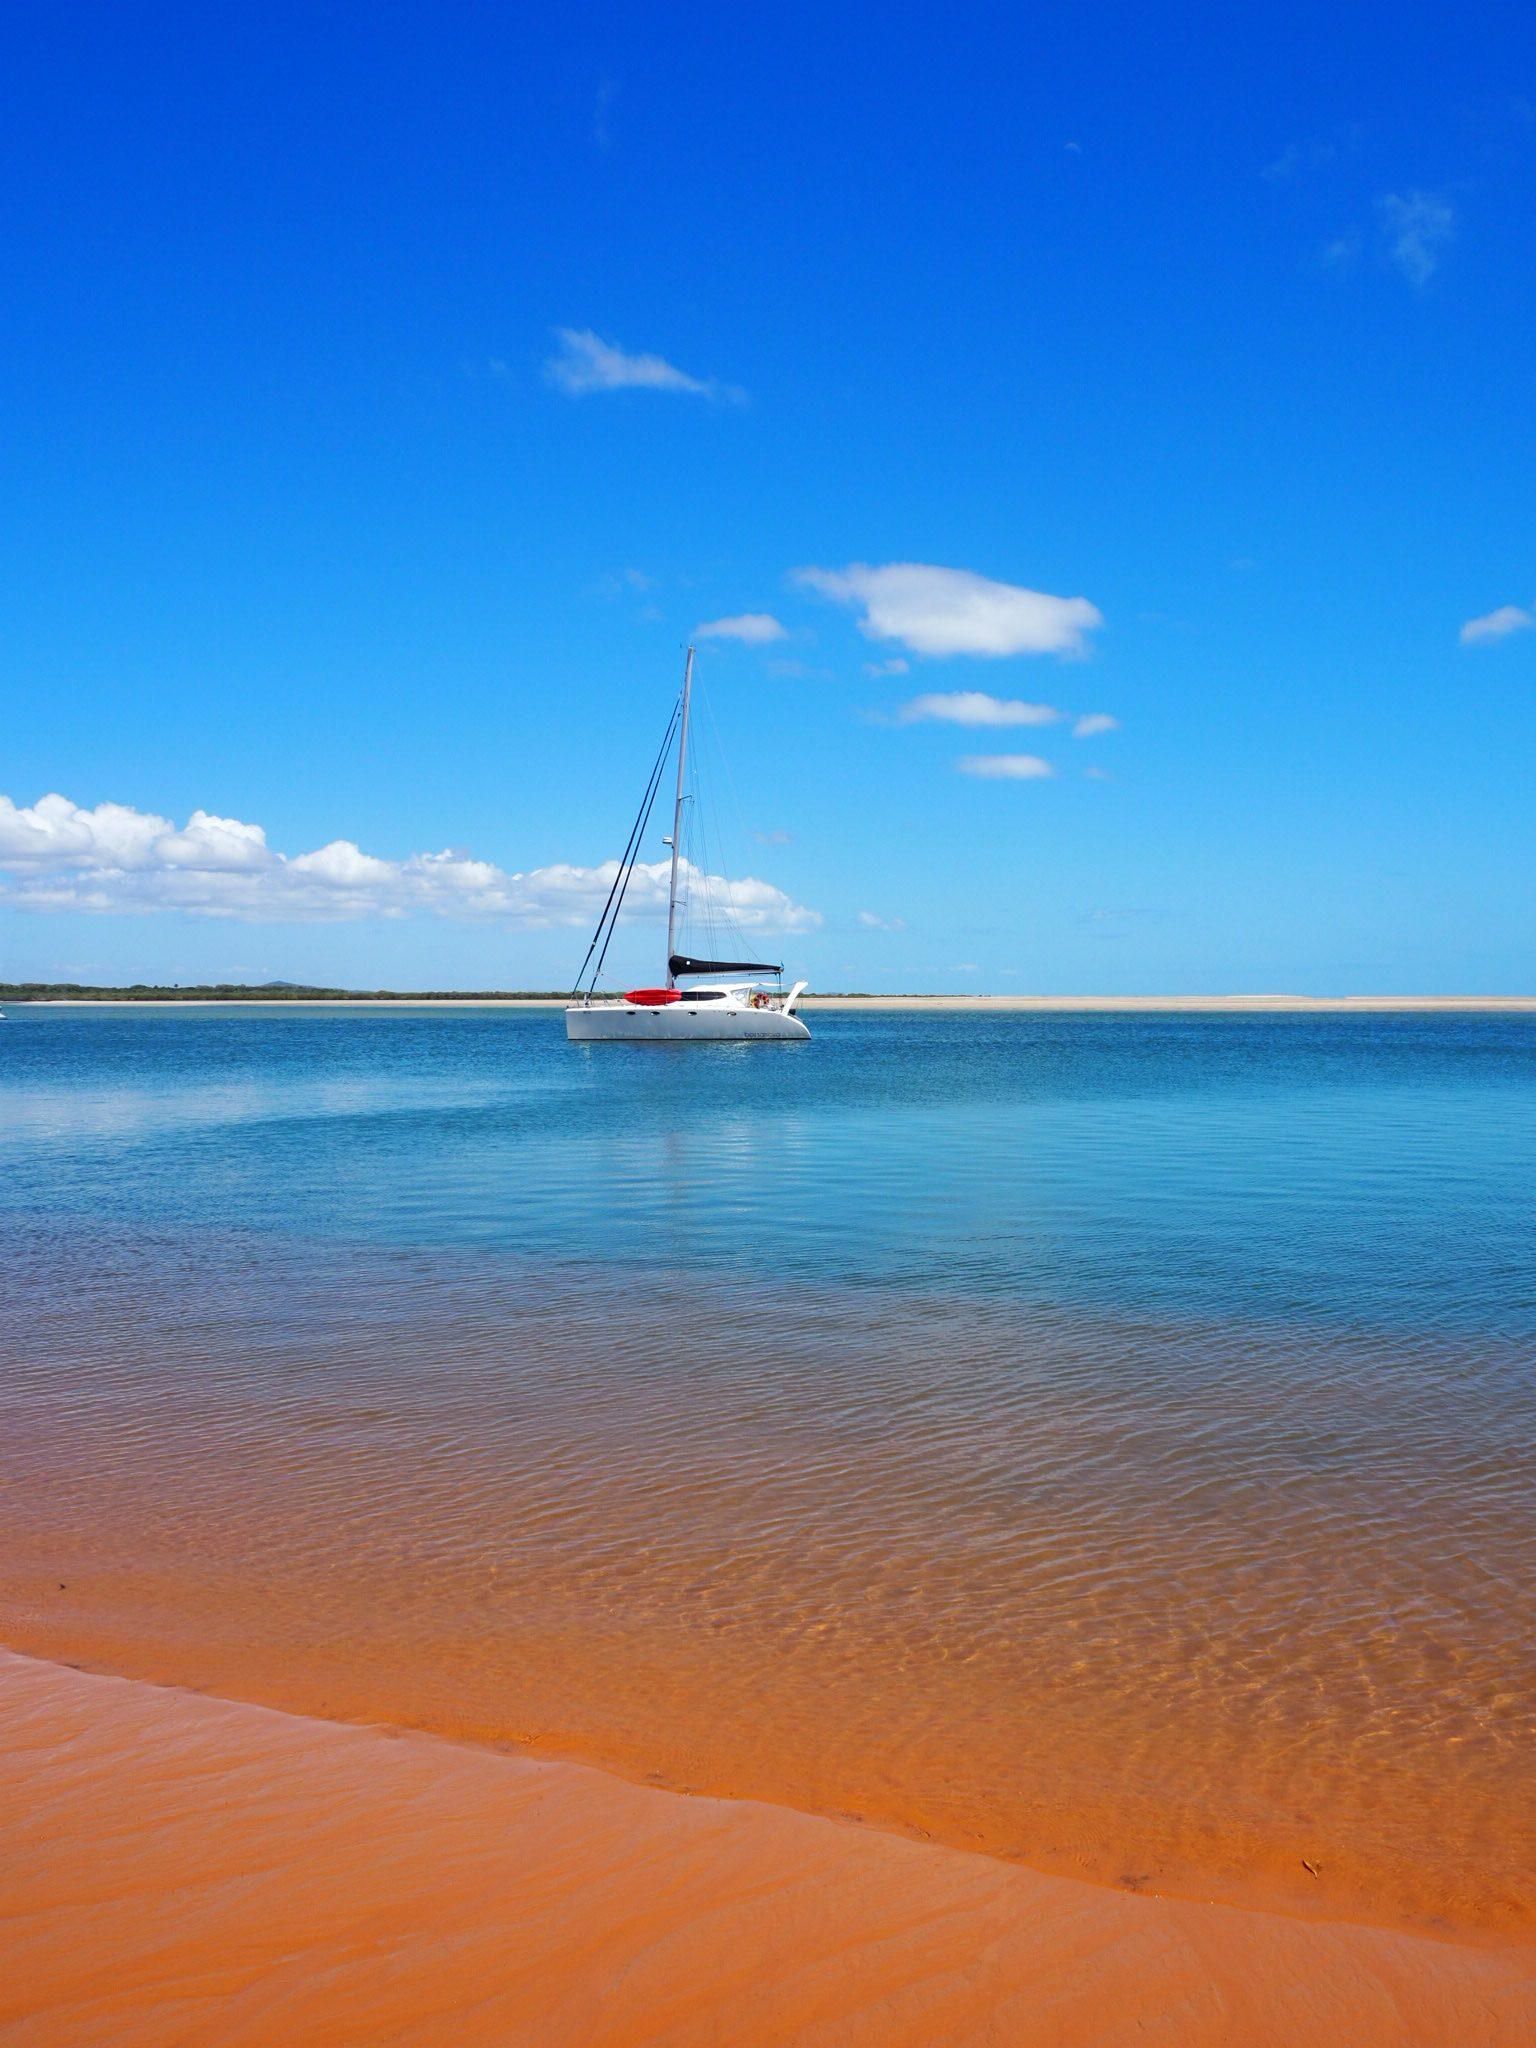 The water's edge sand was orange!